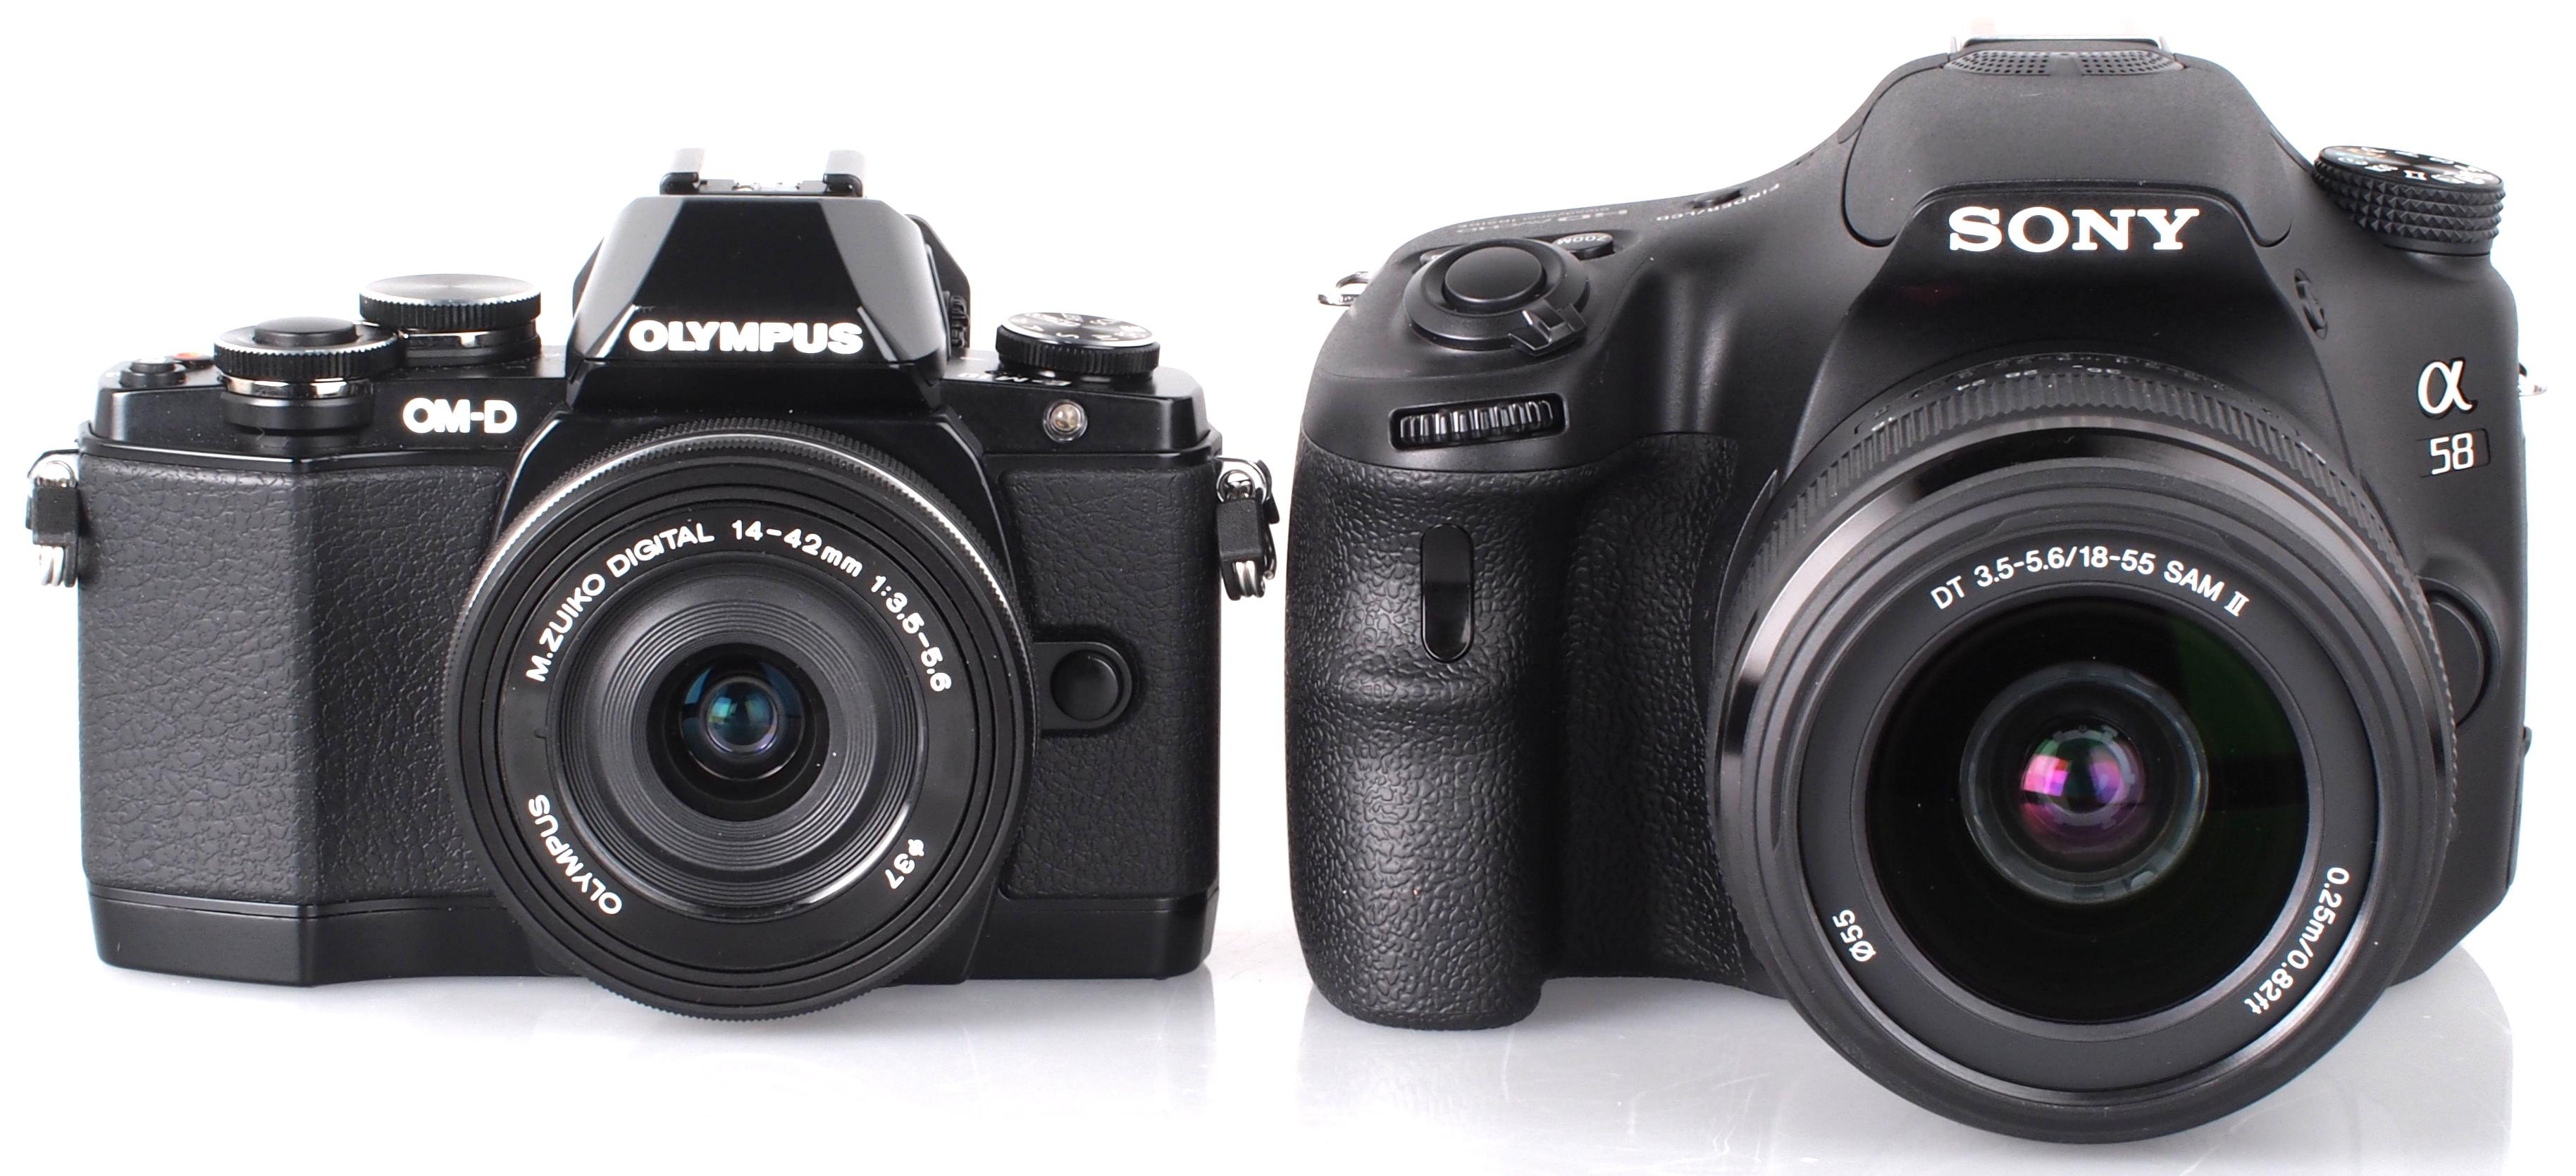 Camera Digital Camera Like Dslr olympus om d e m10 mirrorless vs sony alpha a58 dslr 2